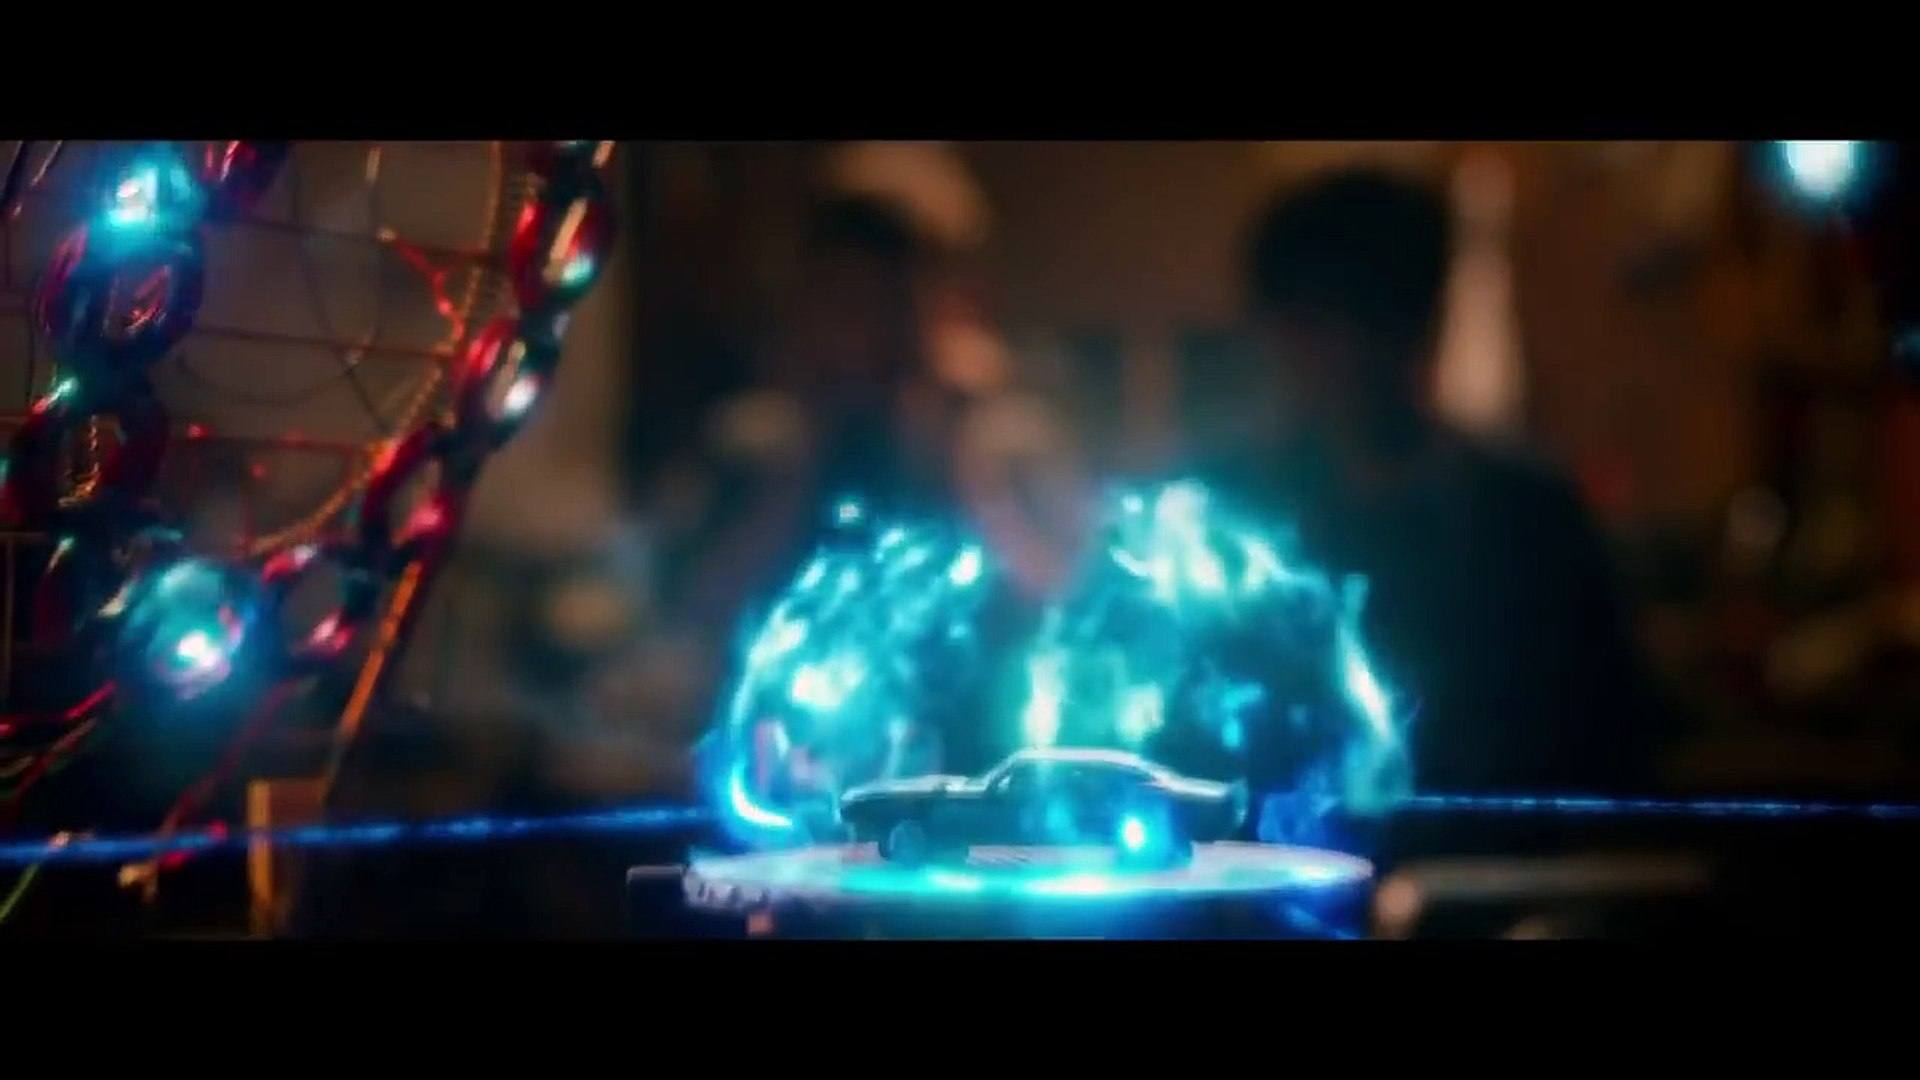 Fantastic Four 3 - Official Trailer 2015, Movie trailer HD,new trailer 2015 http://BestDramaTv.Net